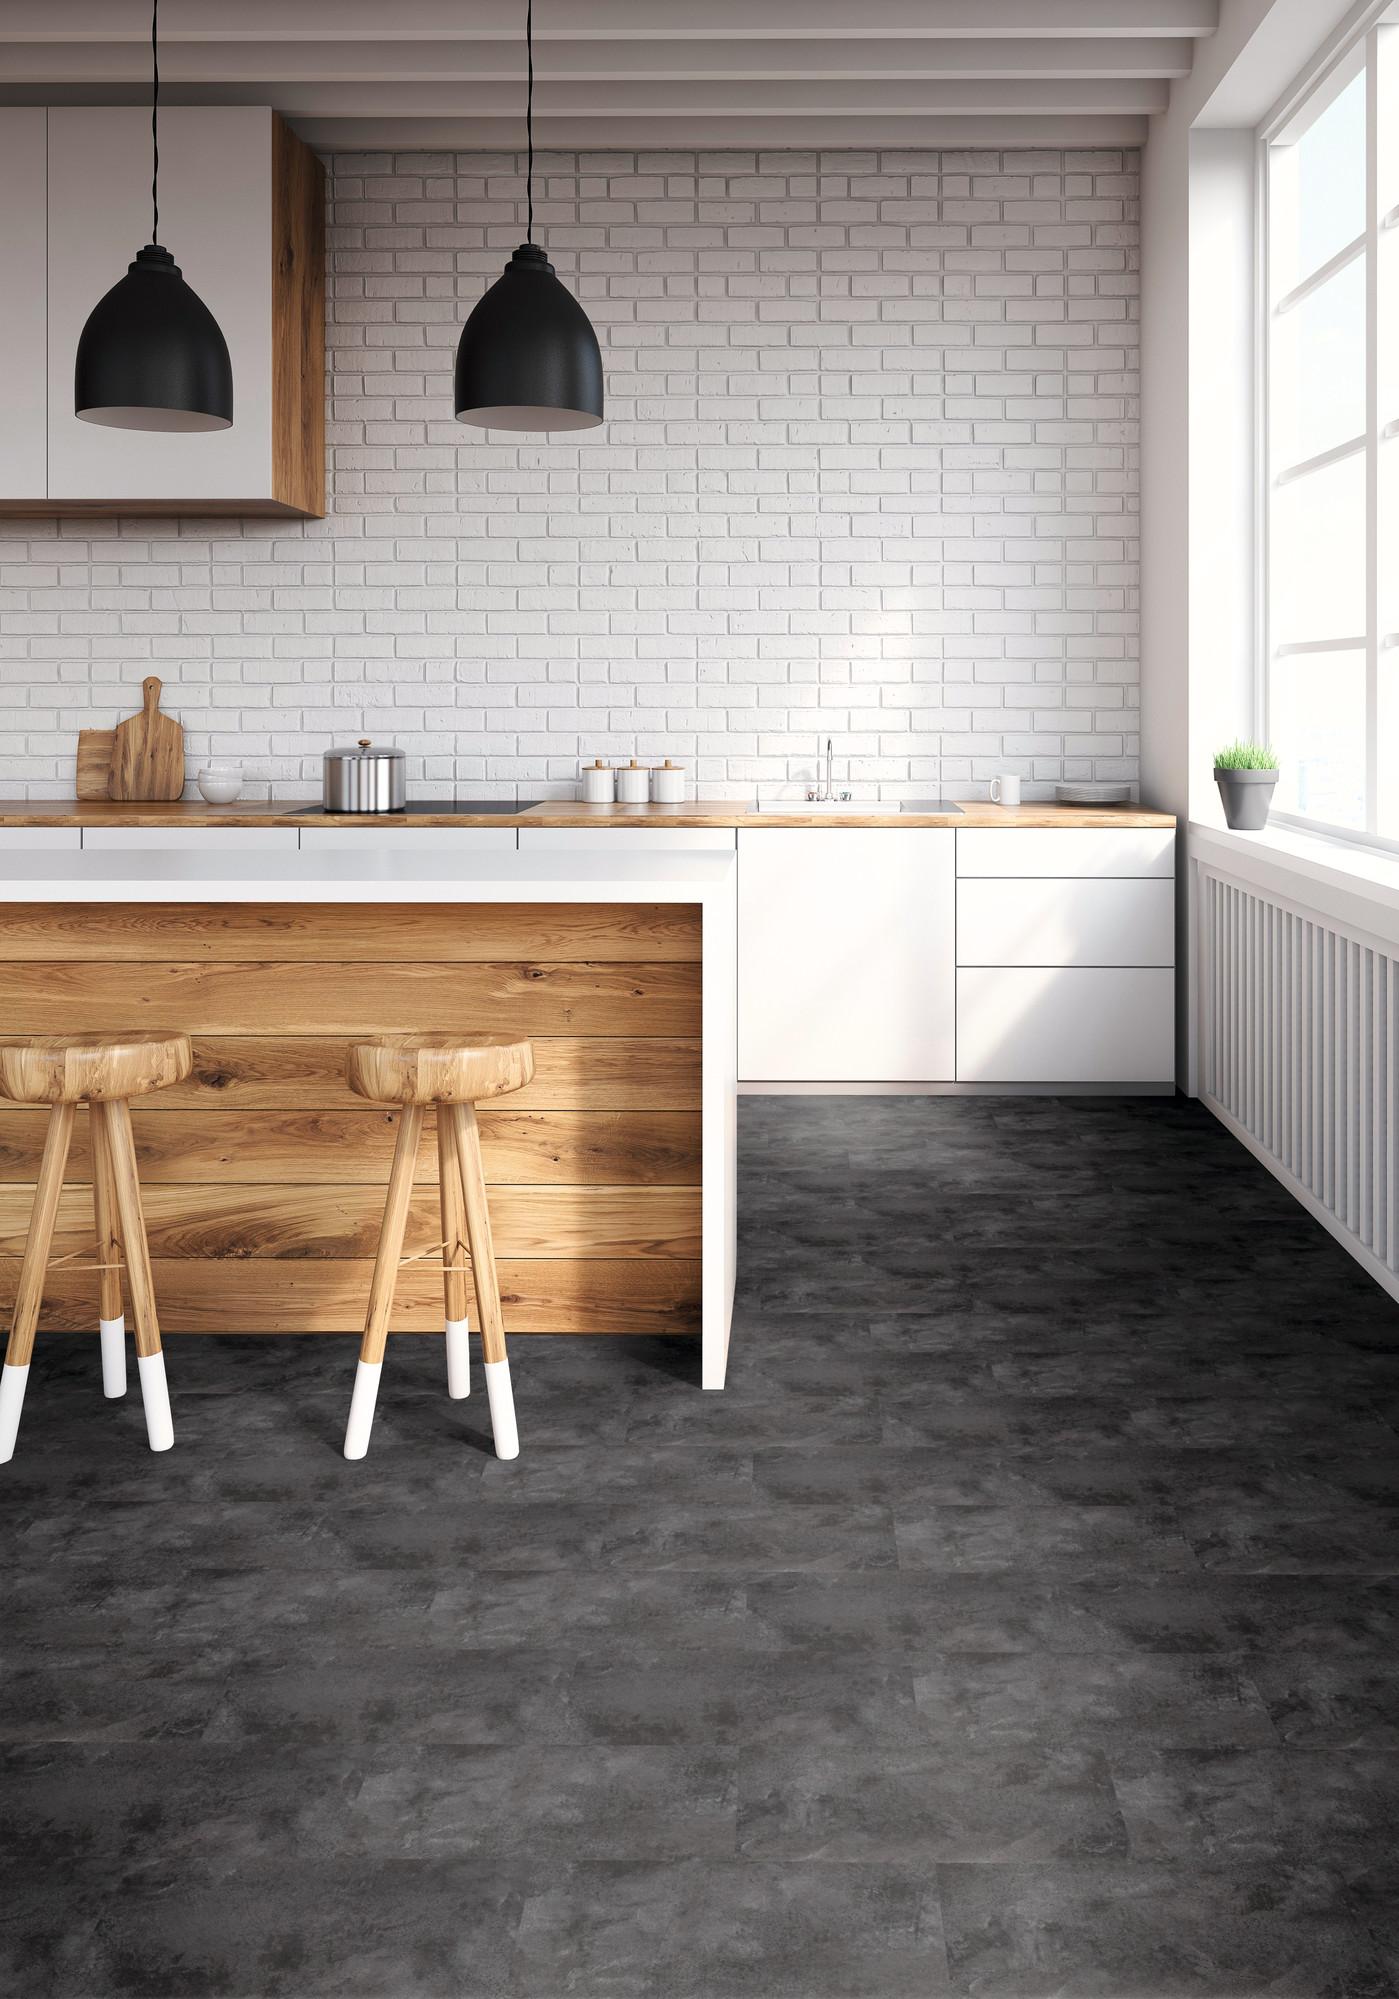 Raumbild - Designboden - Home 0,3 Fliese kleben 2